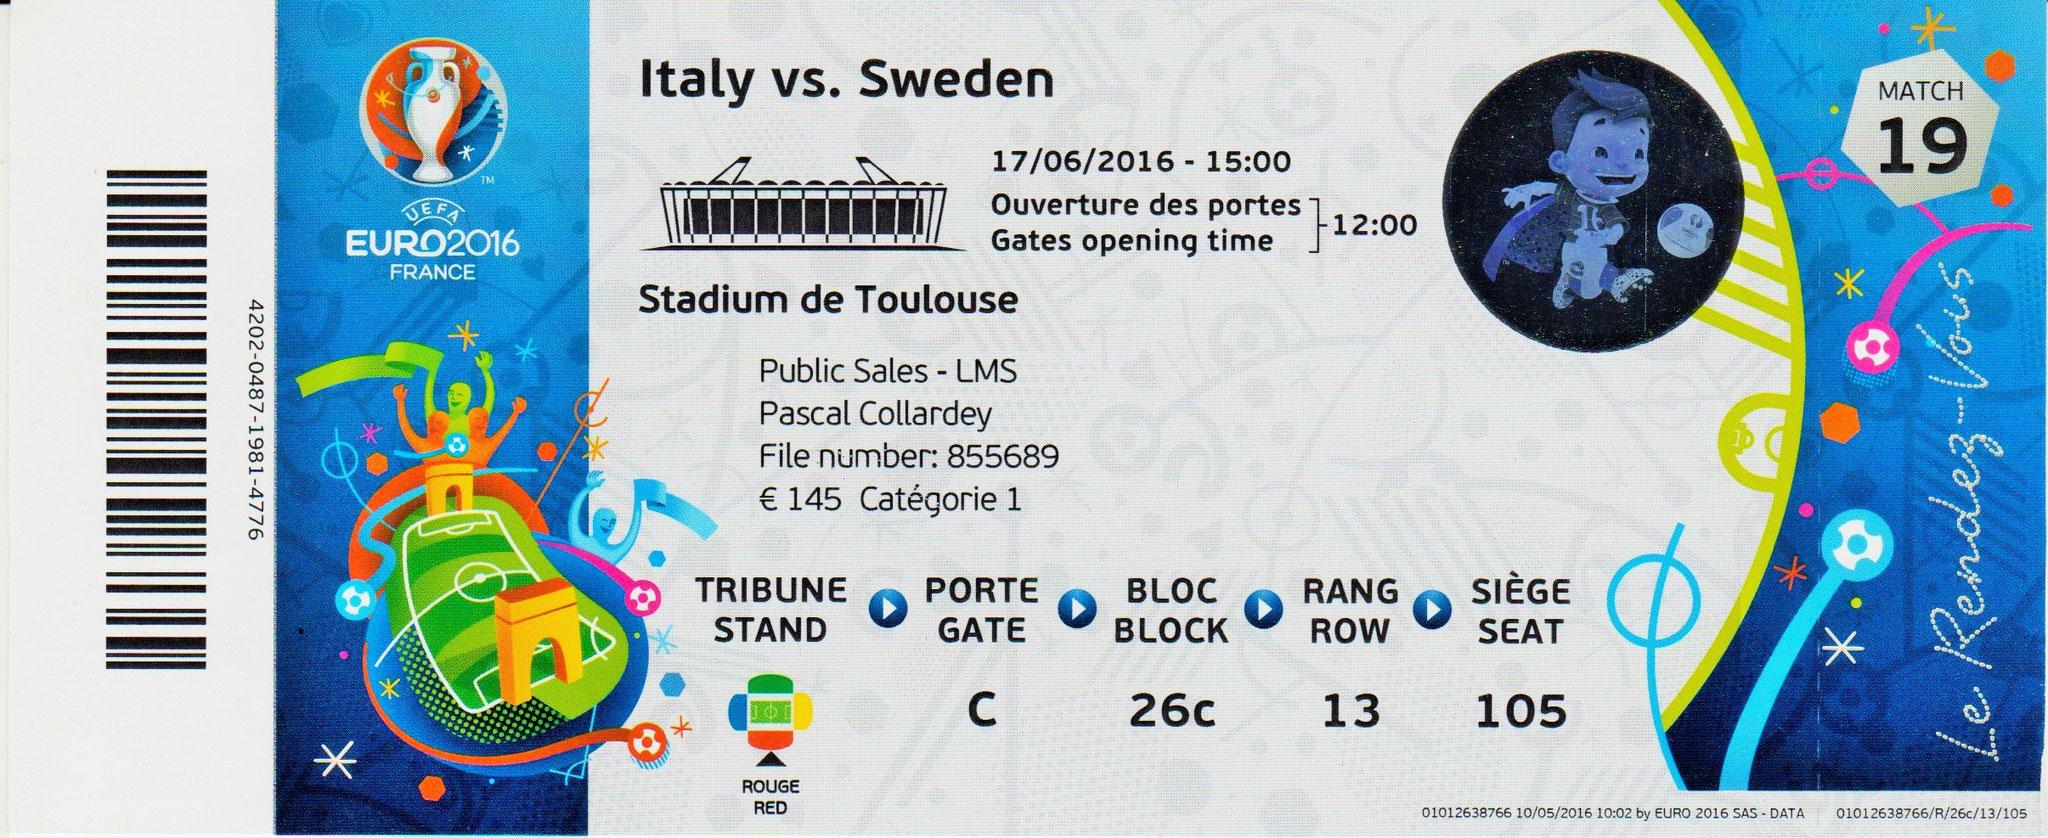 17/06/2016 Toulouse : Italie  1 - 0  Suède > Eder (Ita) <